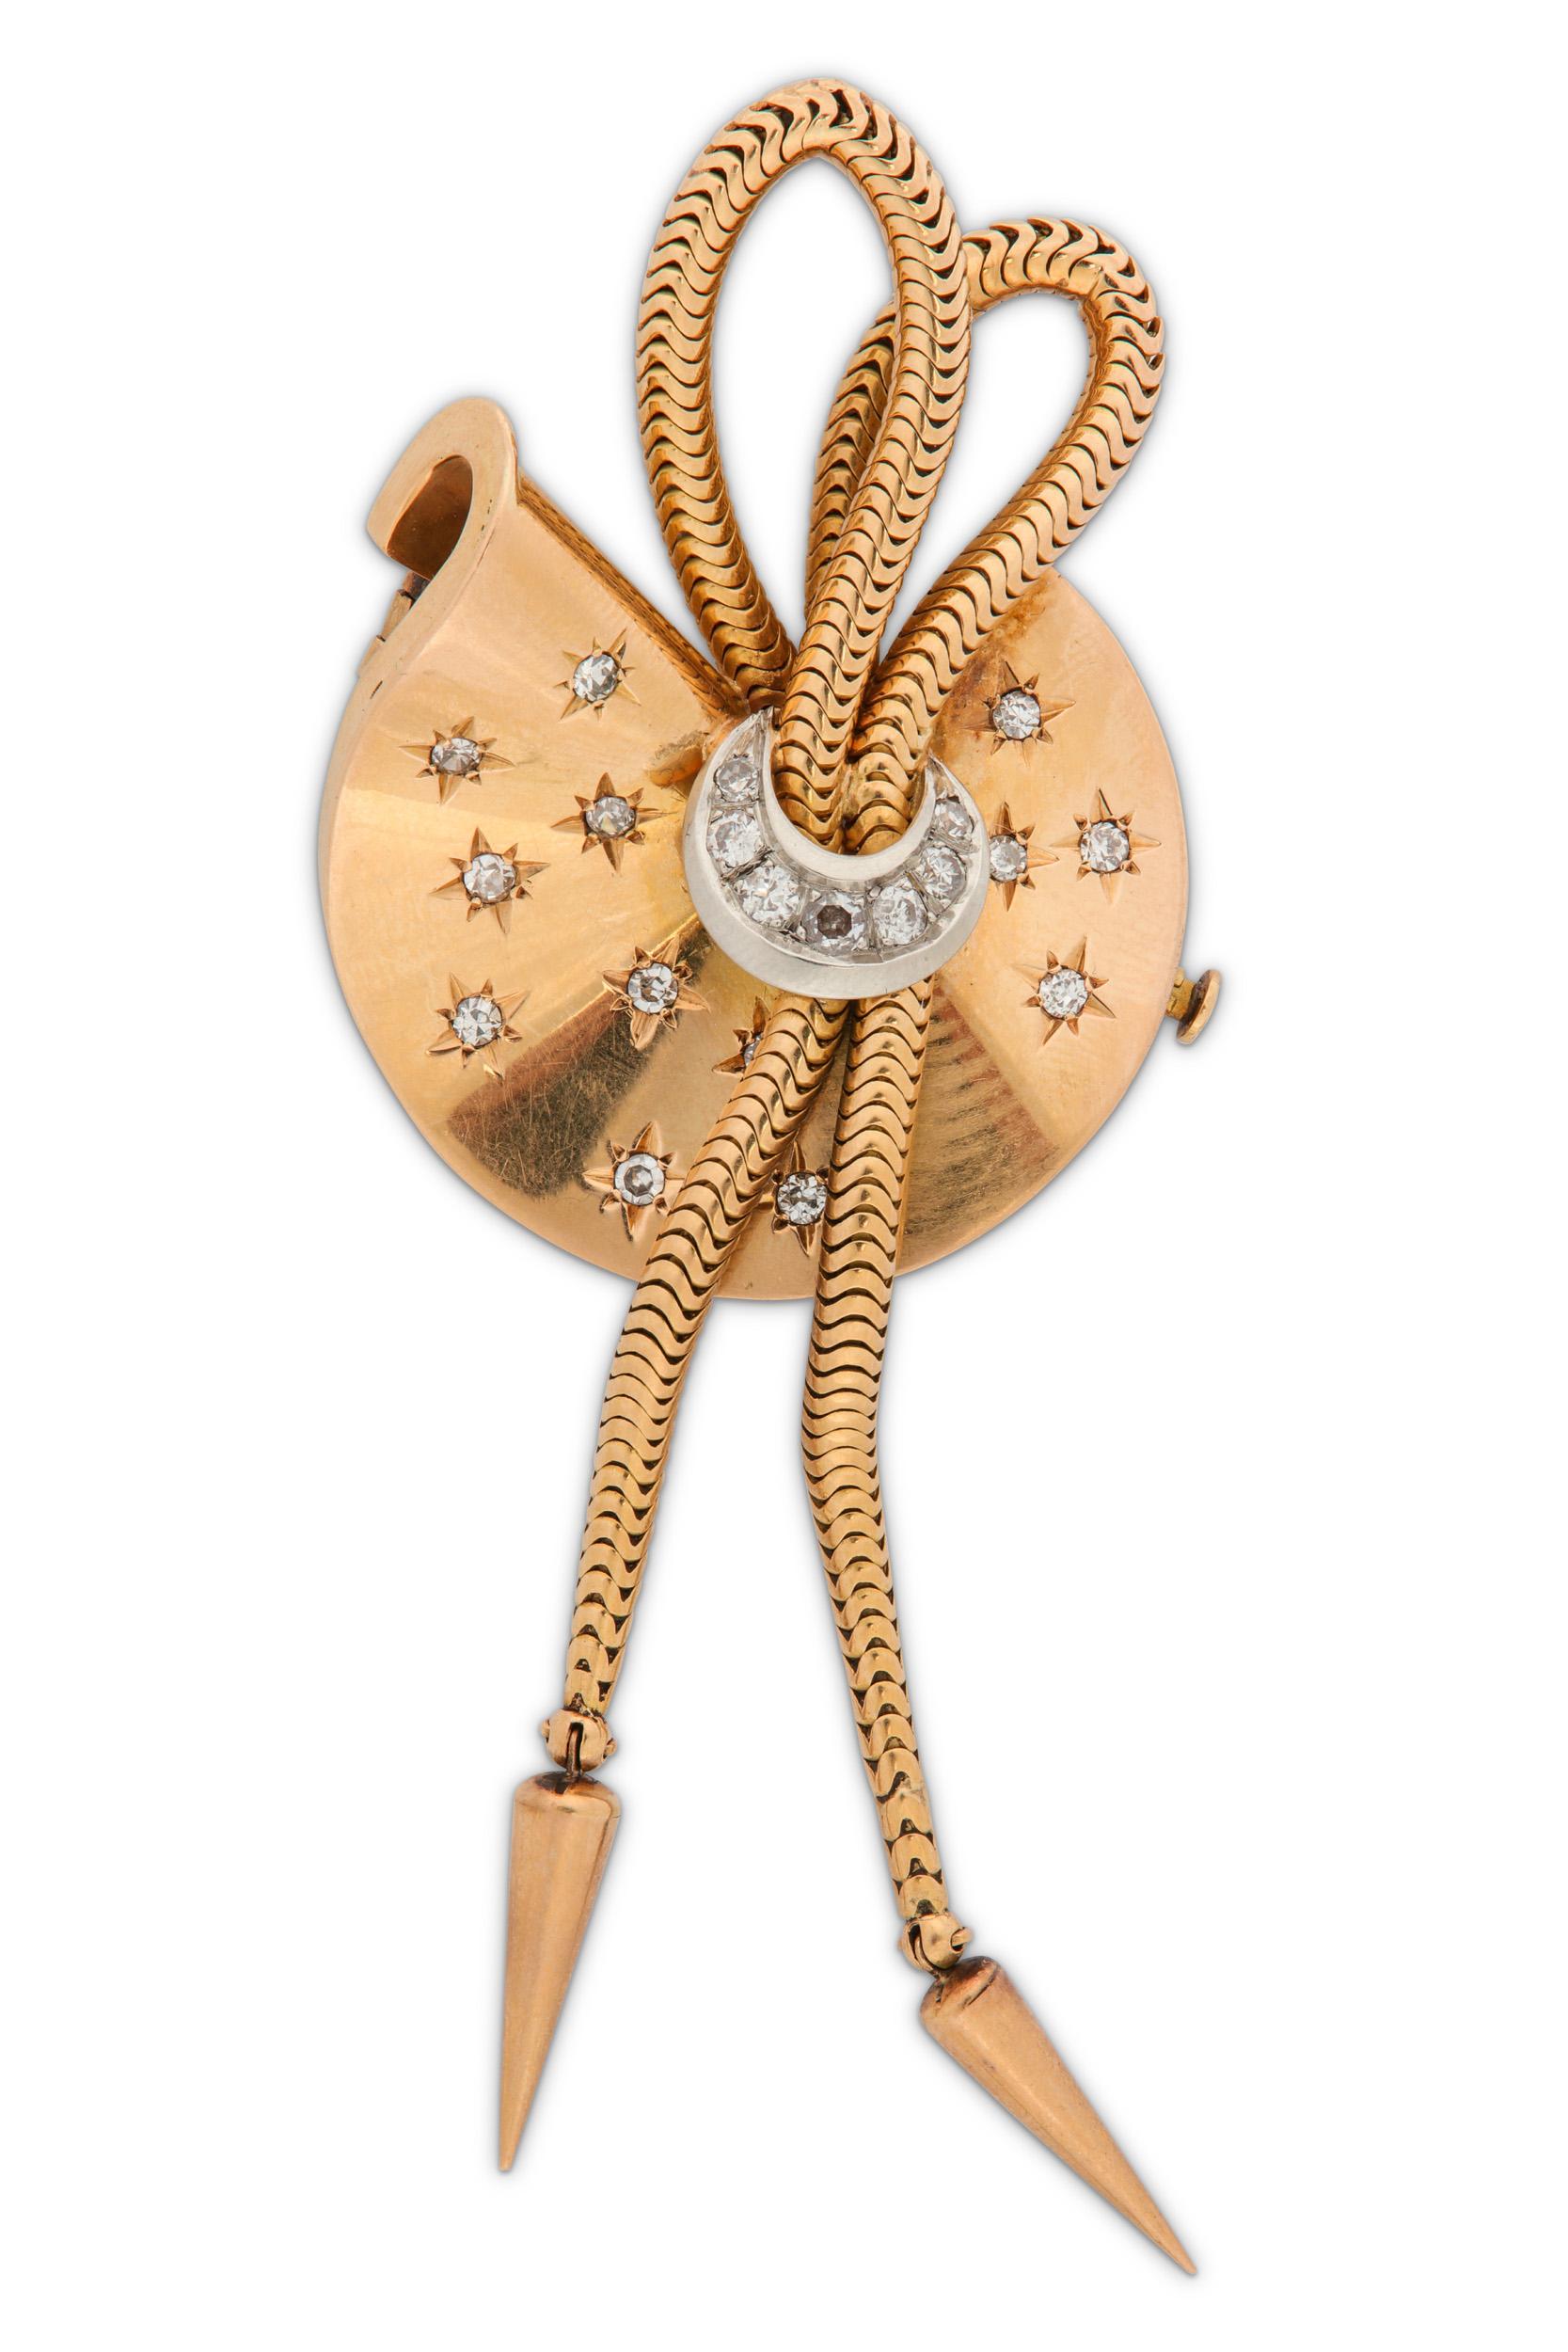 Lot 18 - A diamond tassel brooch, circa 1940